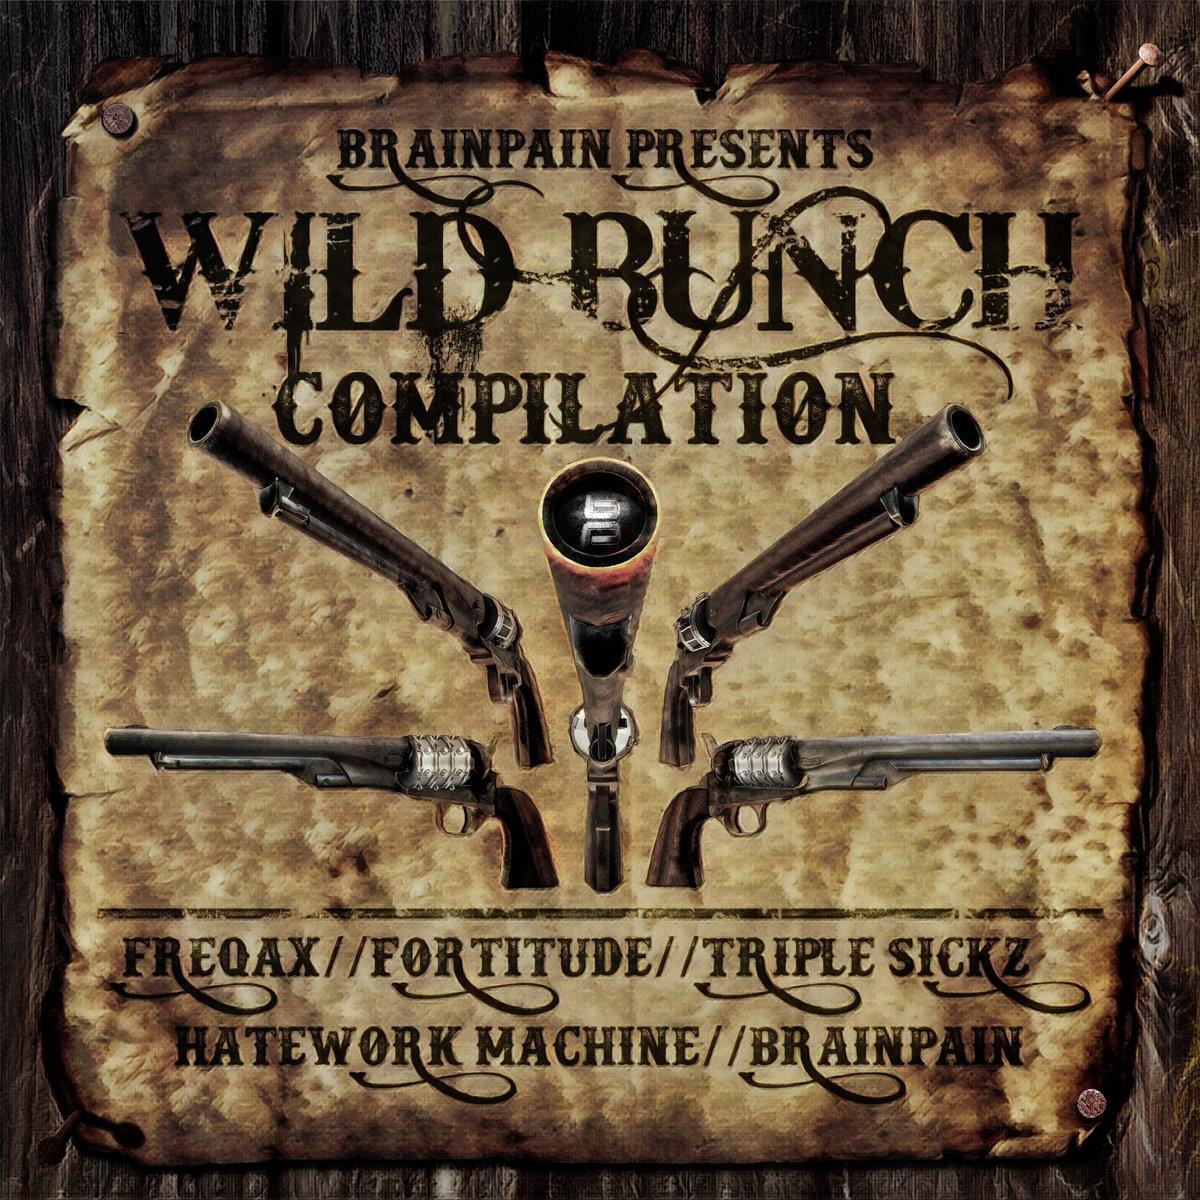 brainpain-the-wild-bunch-compilation